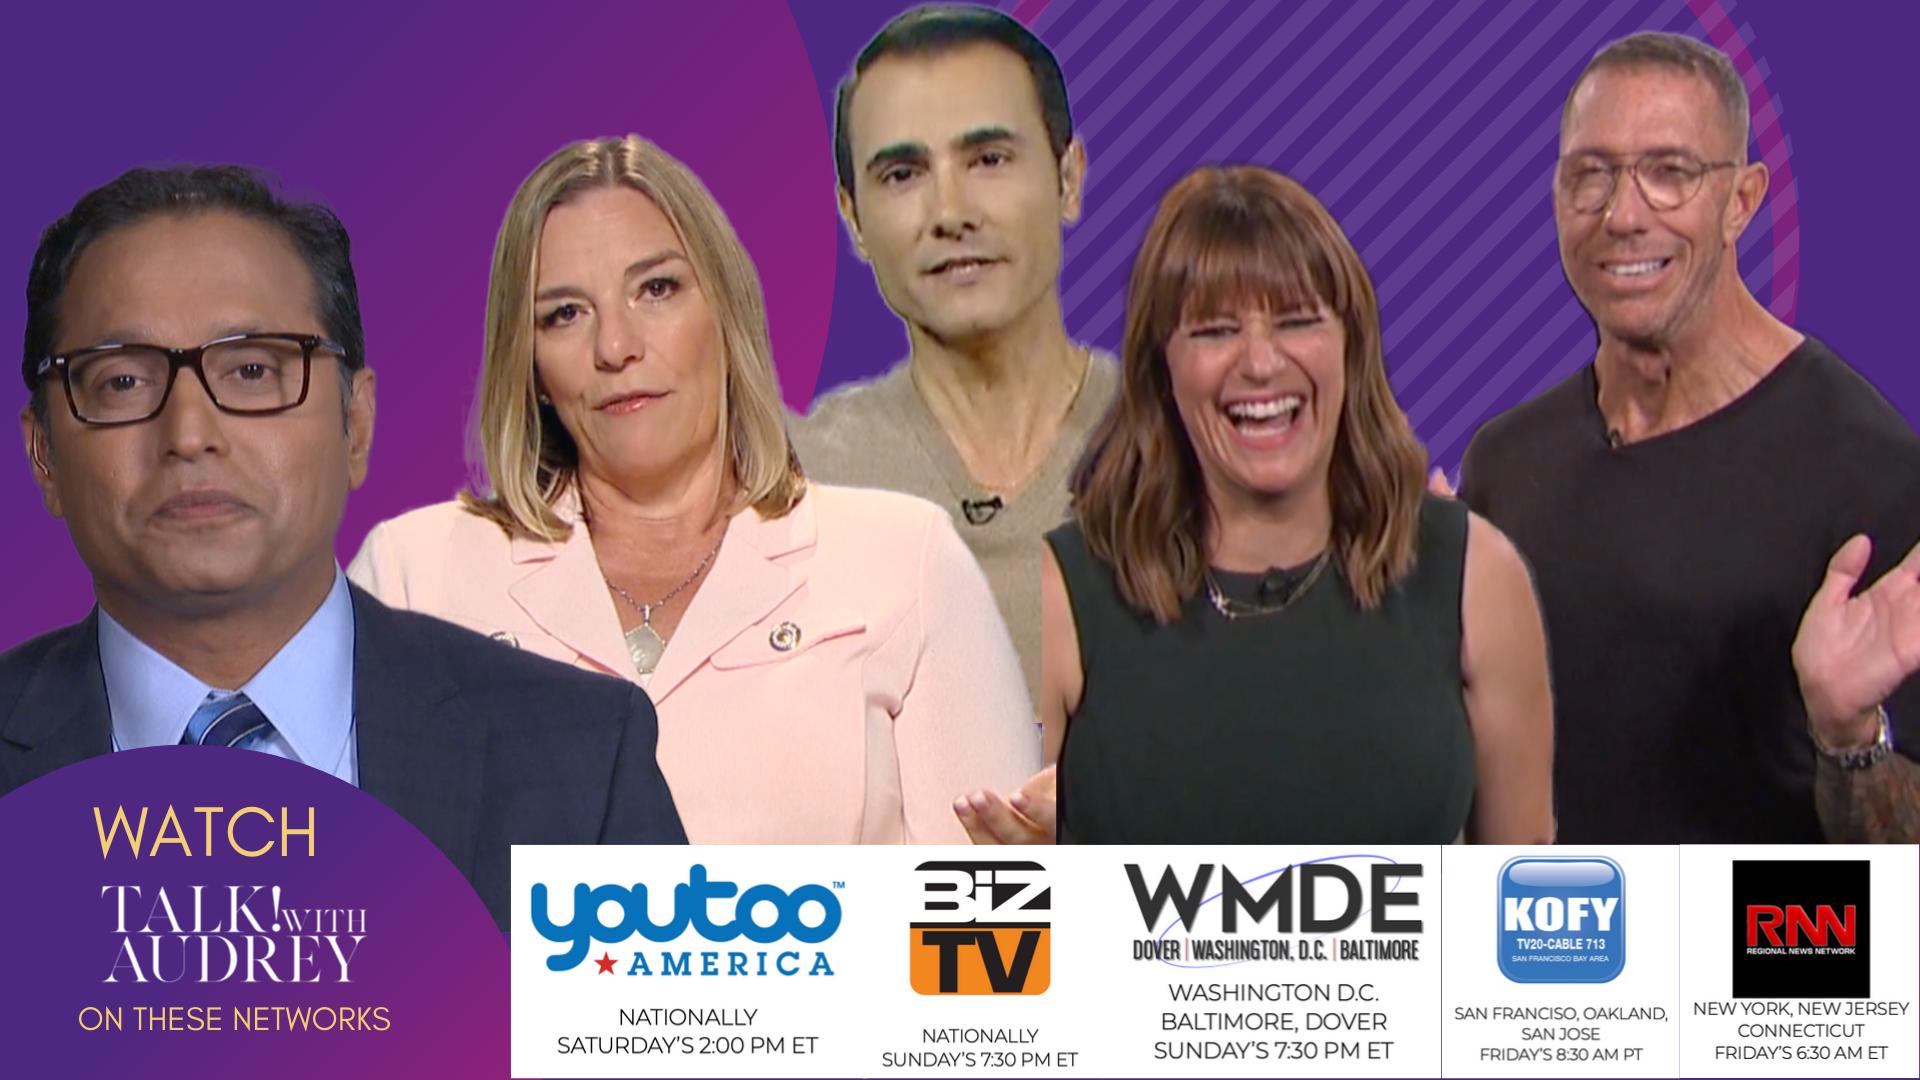 September 20-22, 2019 – TALK! with AUDREY TV